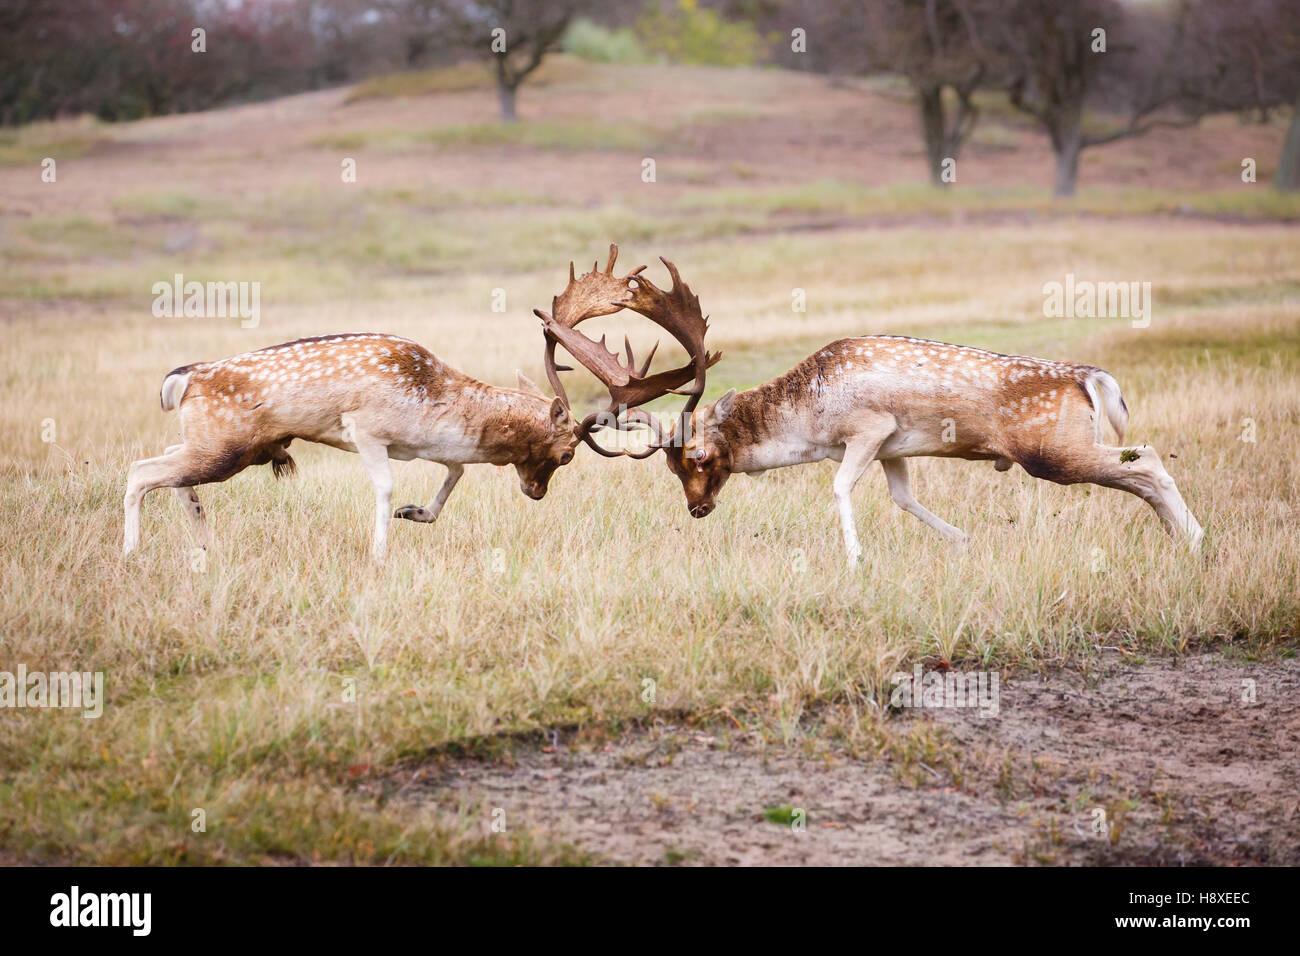 two fallow deer bucks fighting during the rutting season - Stock Image